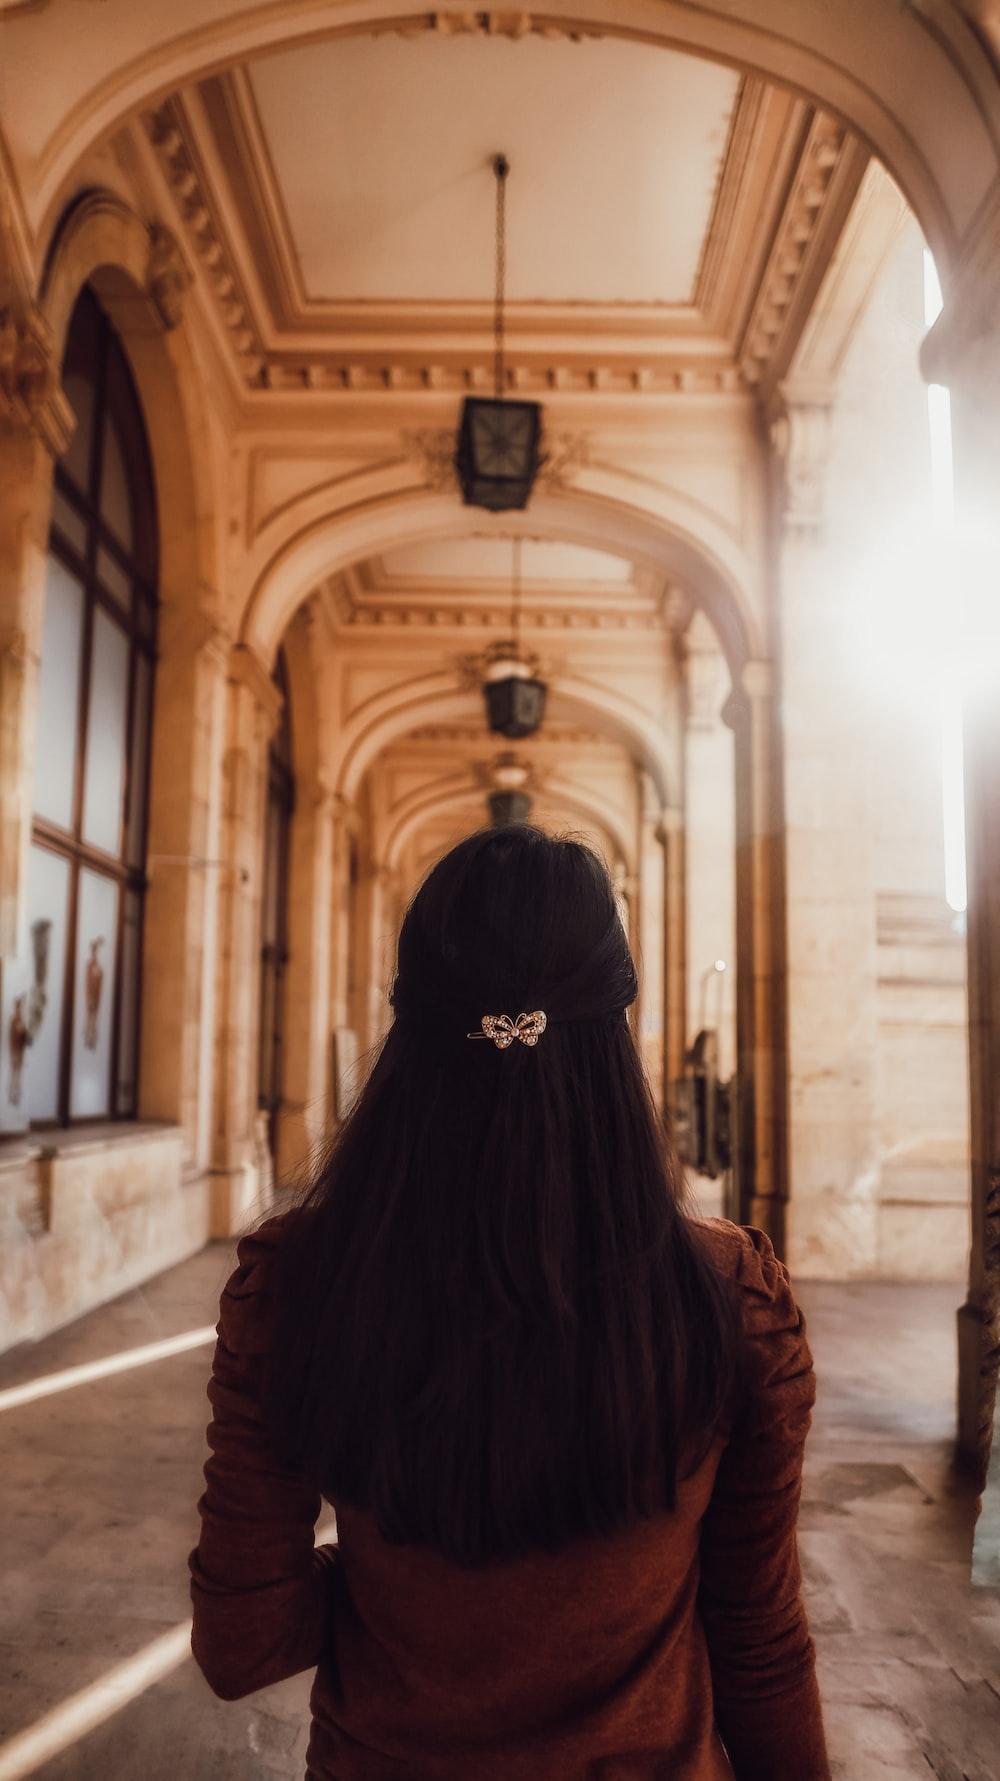 woman in black hijab standing on hallway